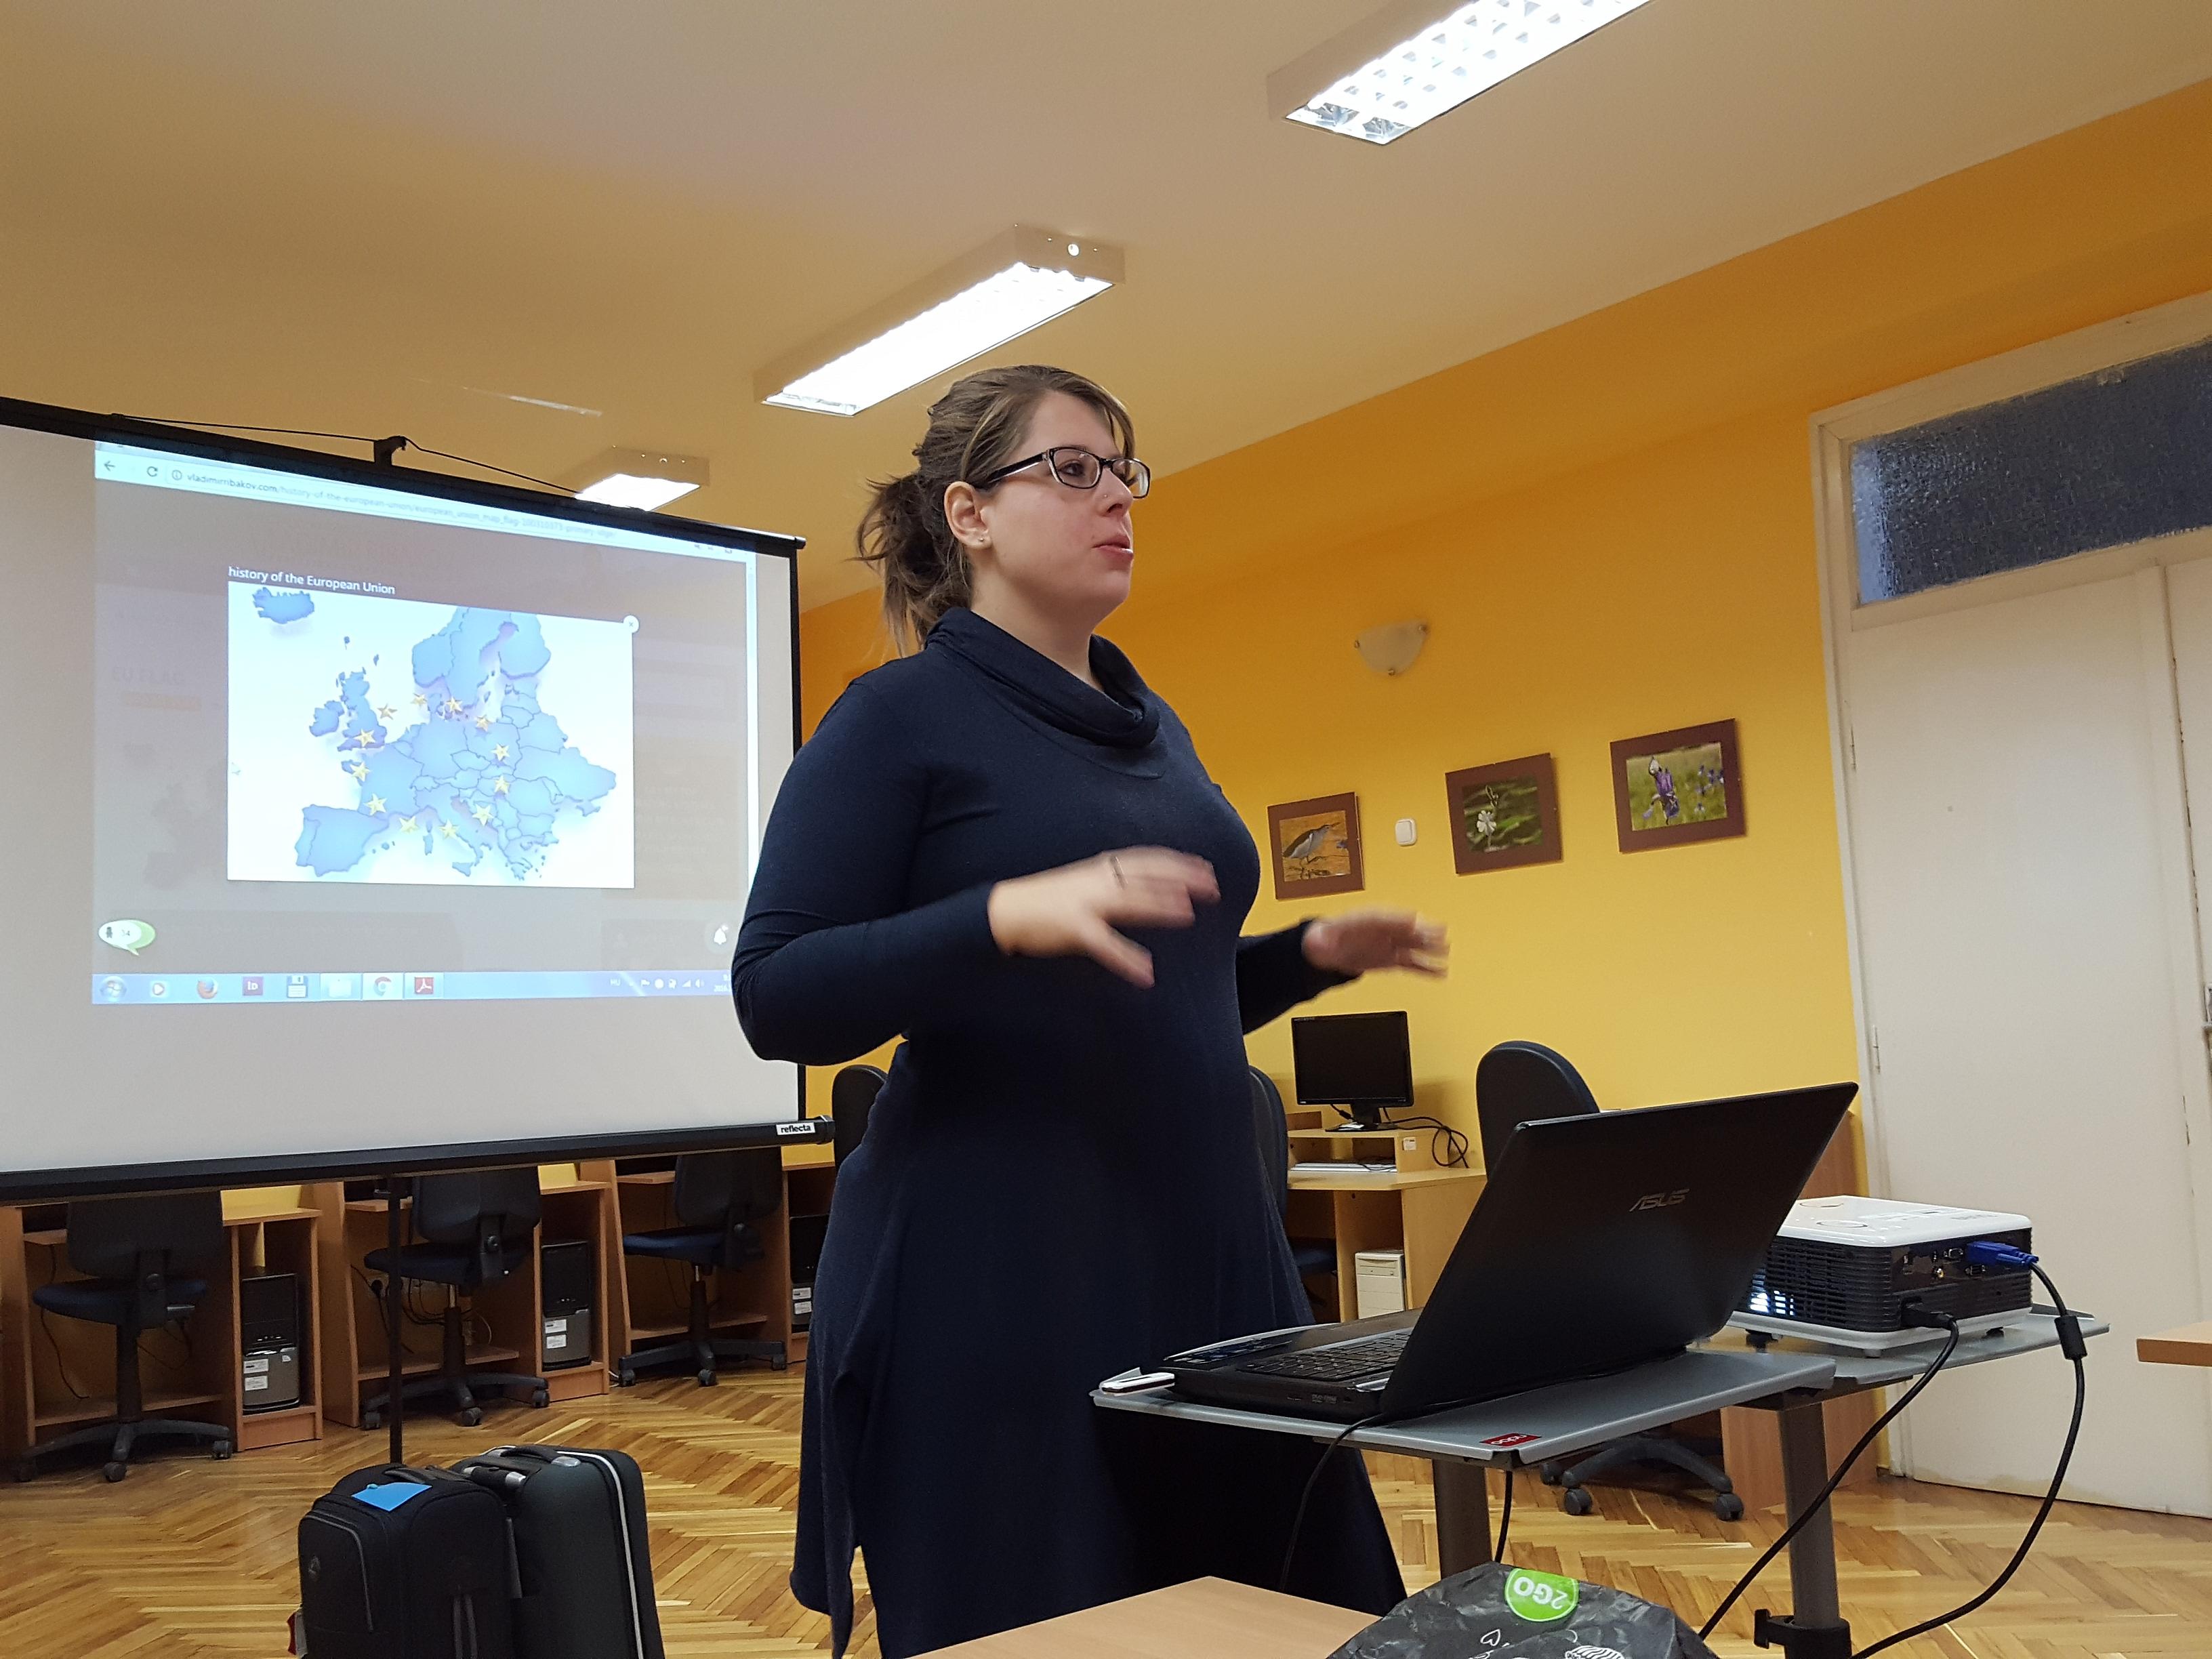 Laurus Youth Mediator Project